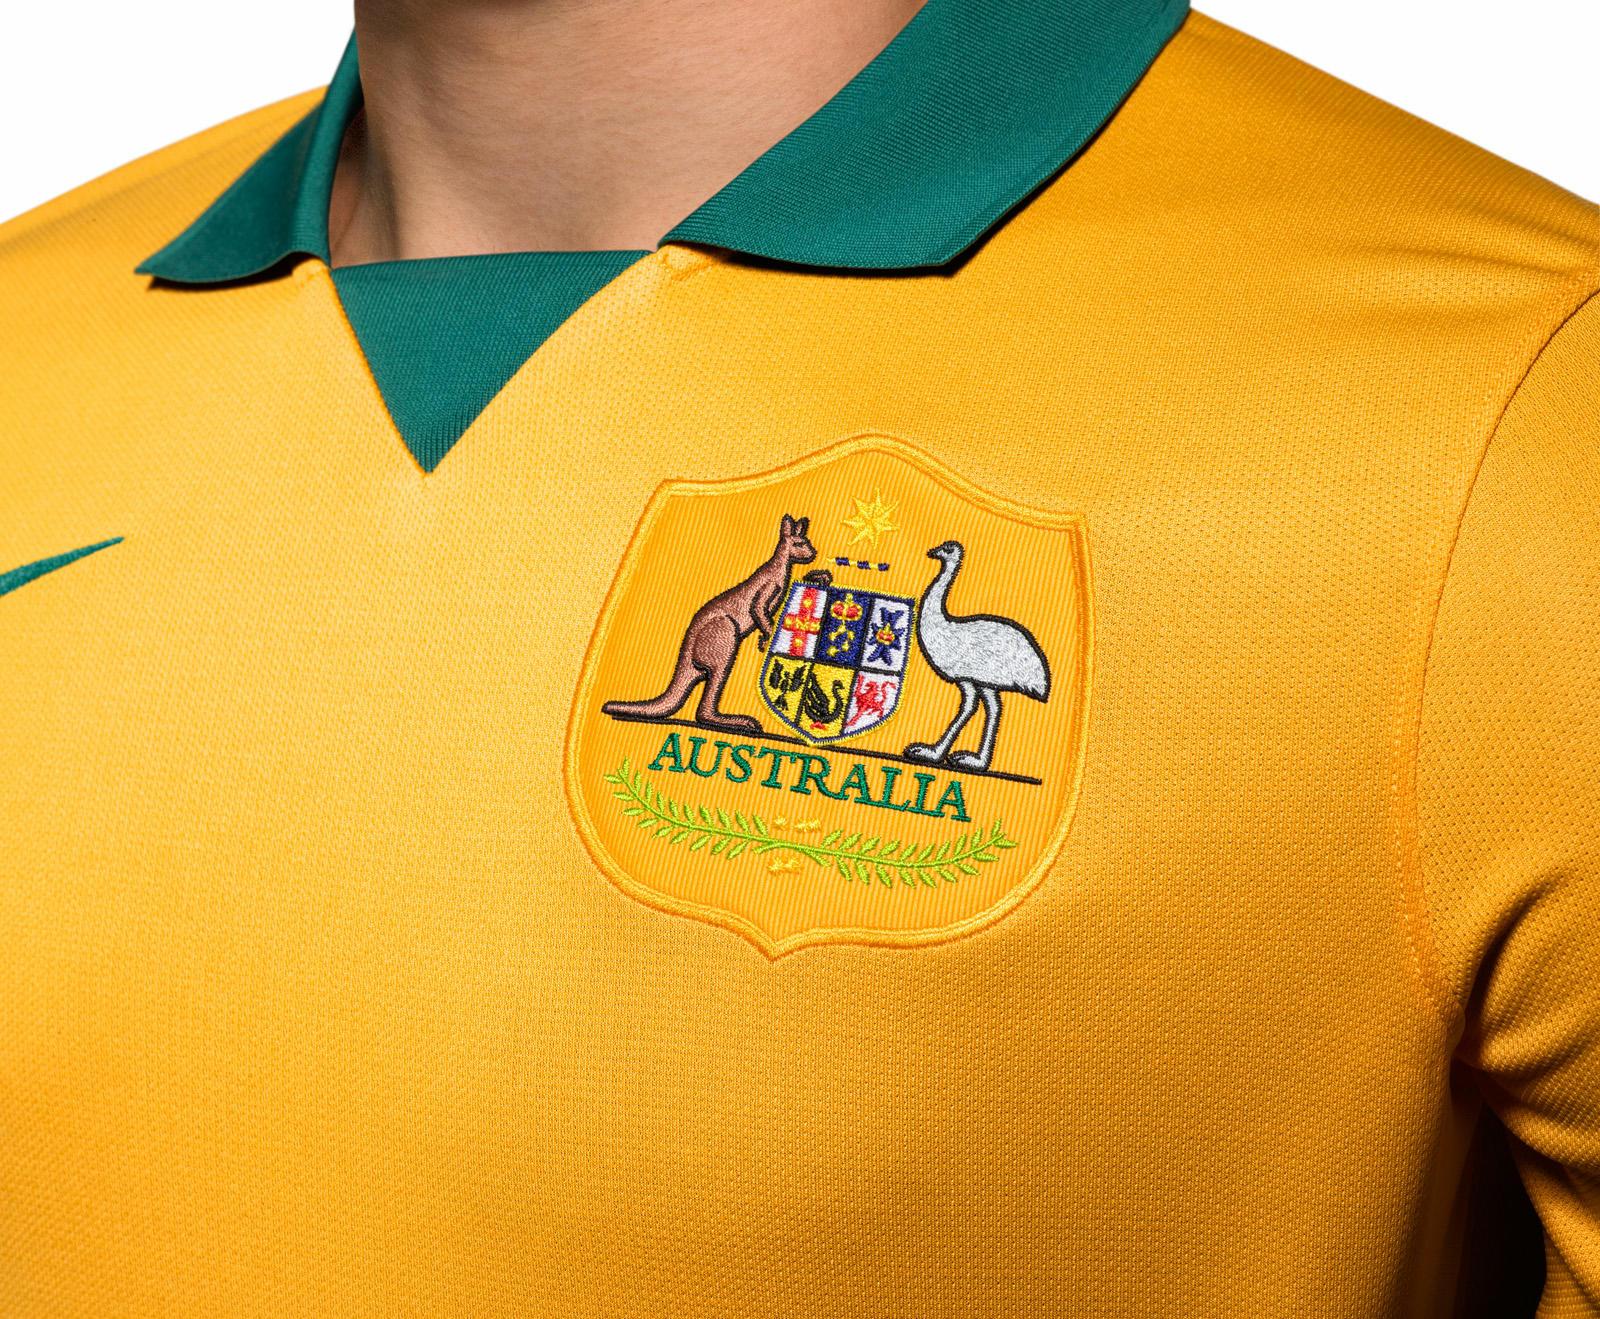 Australia 2014 World Cup Australia 2014 World Cup